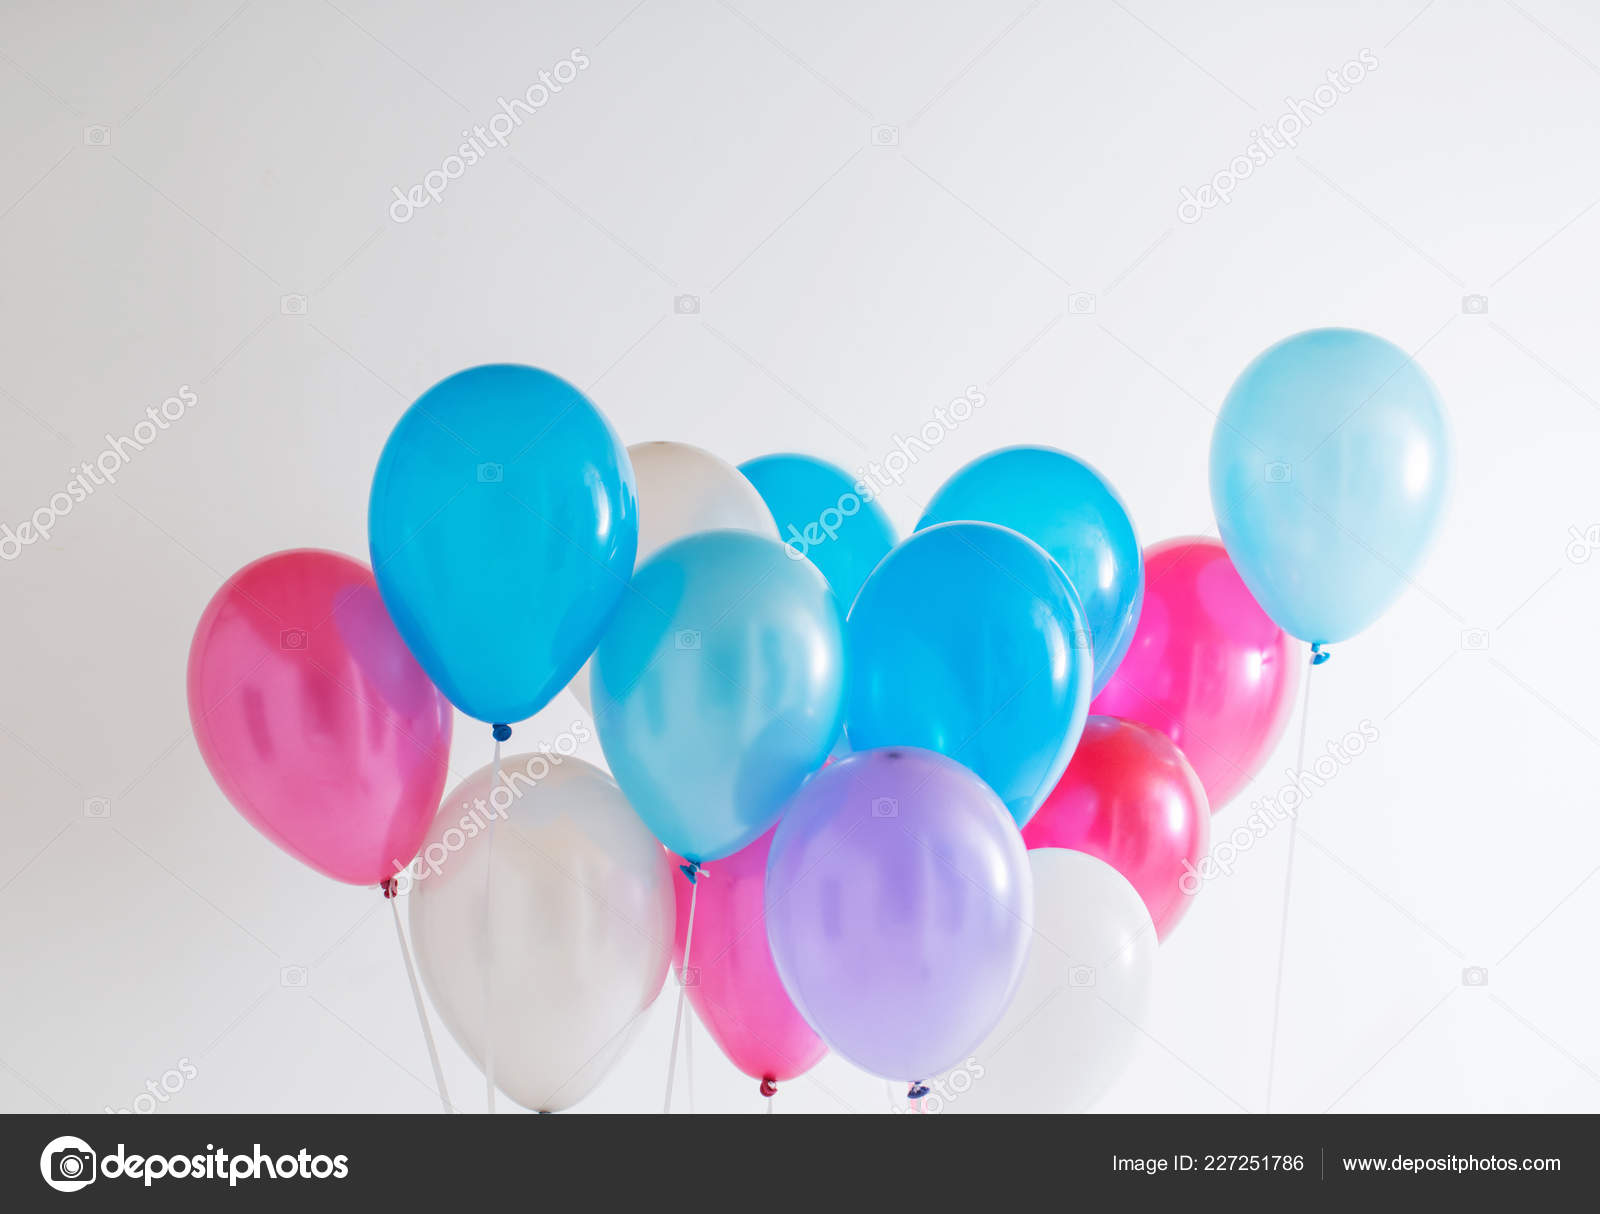 62a3c3cab590 Μπαλόνια Άσπρο Φόντο — Φωτογραφία Αρχείου © Kruchenkova  227251786